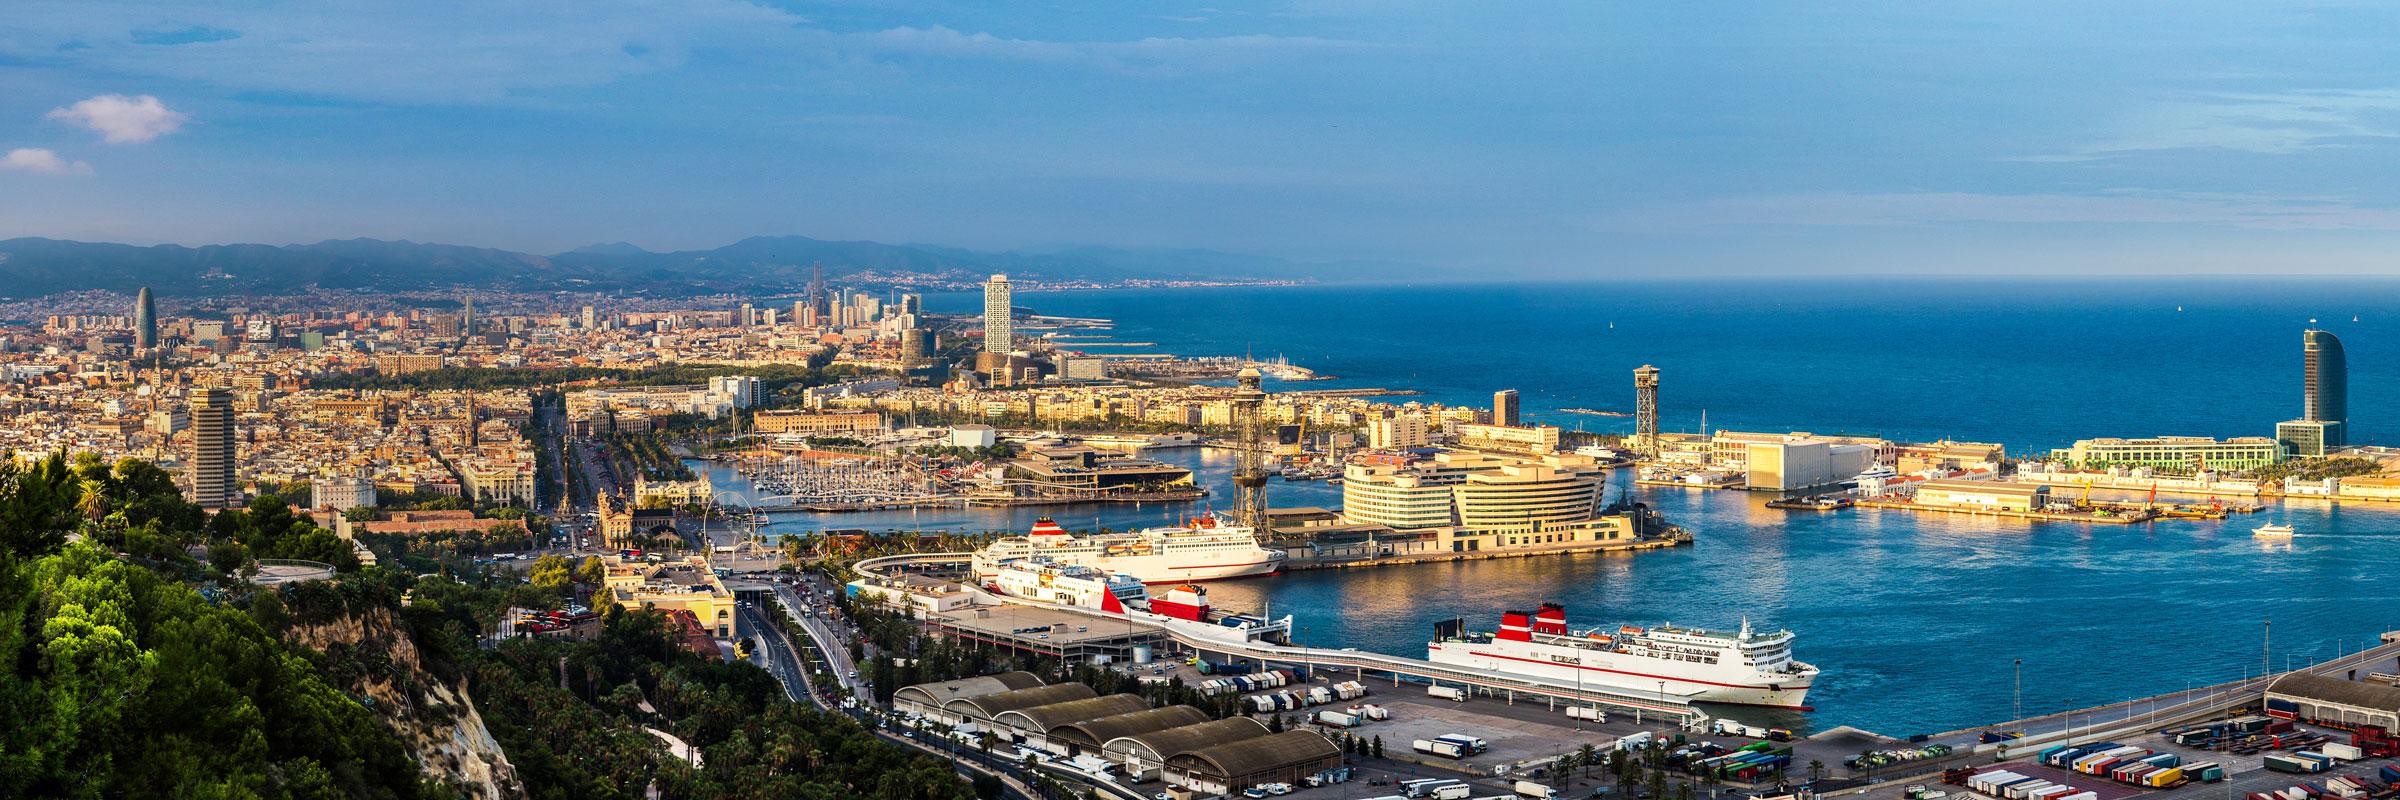 панорамный вид на Барселону